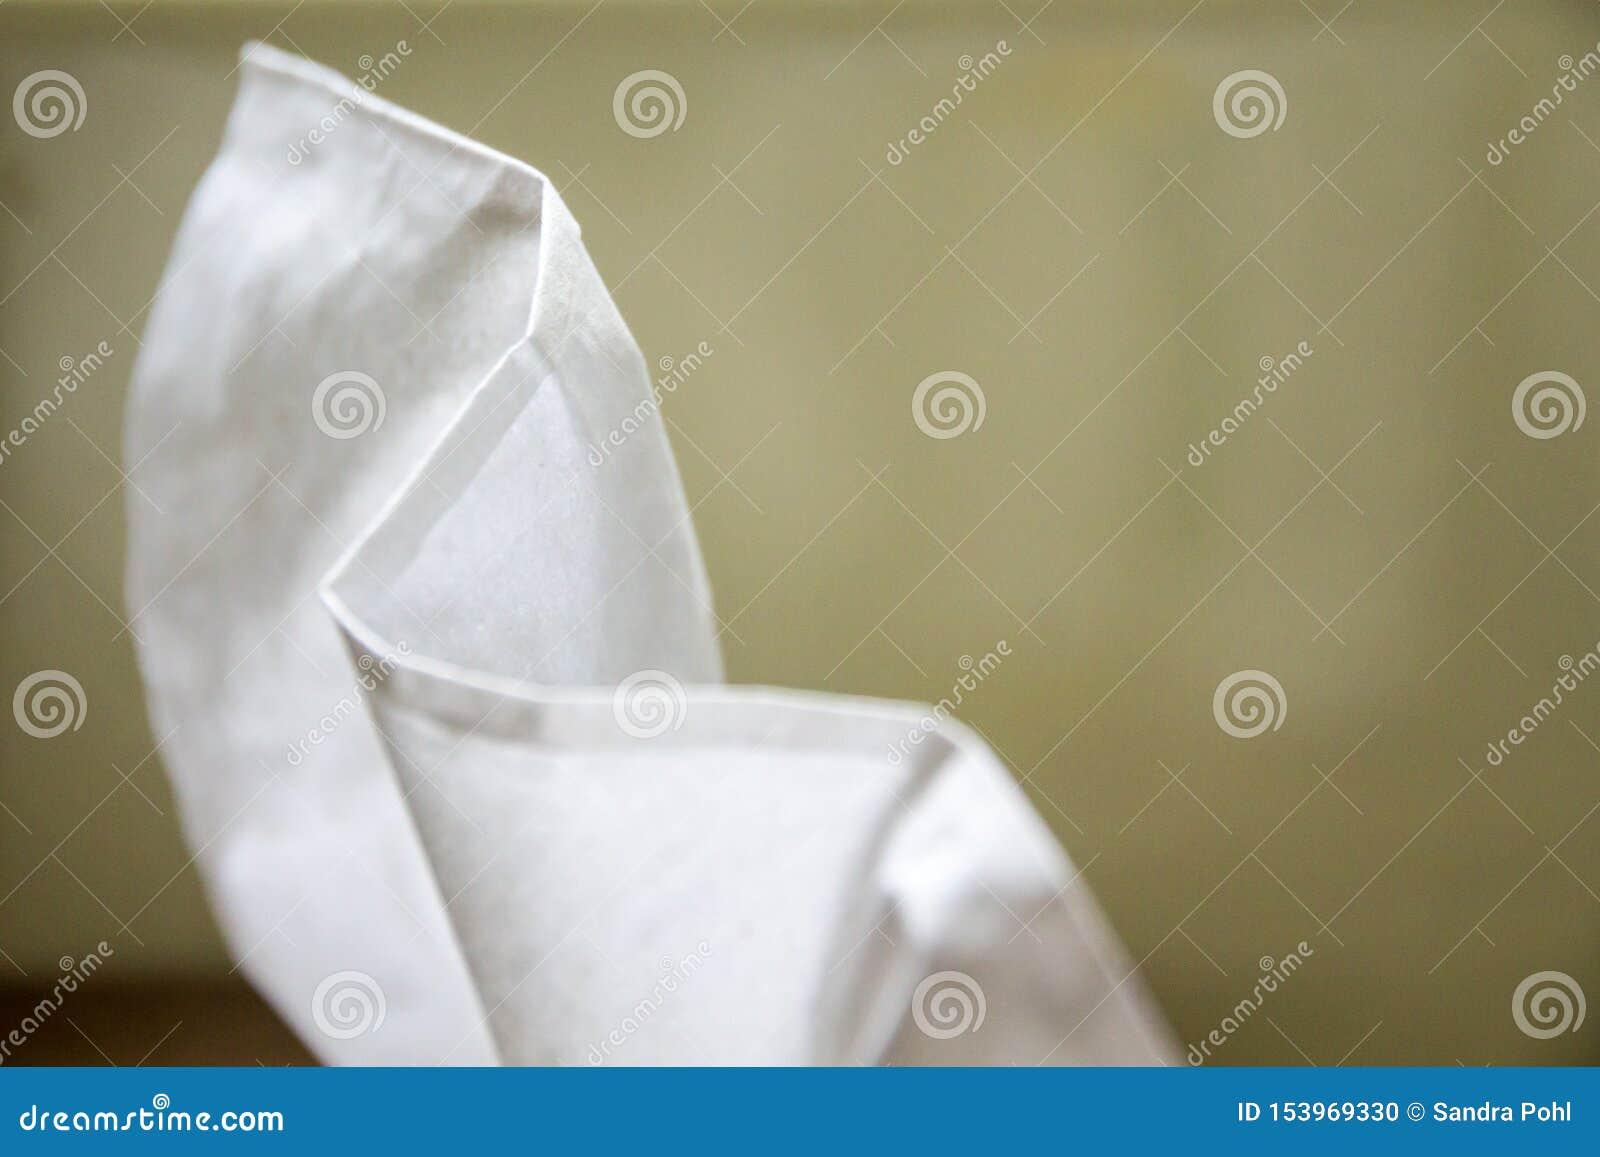 Towelette blanco en fondo verde